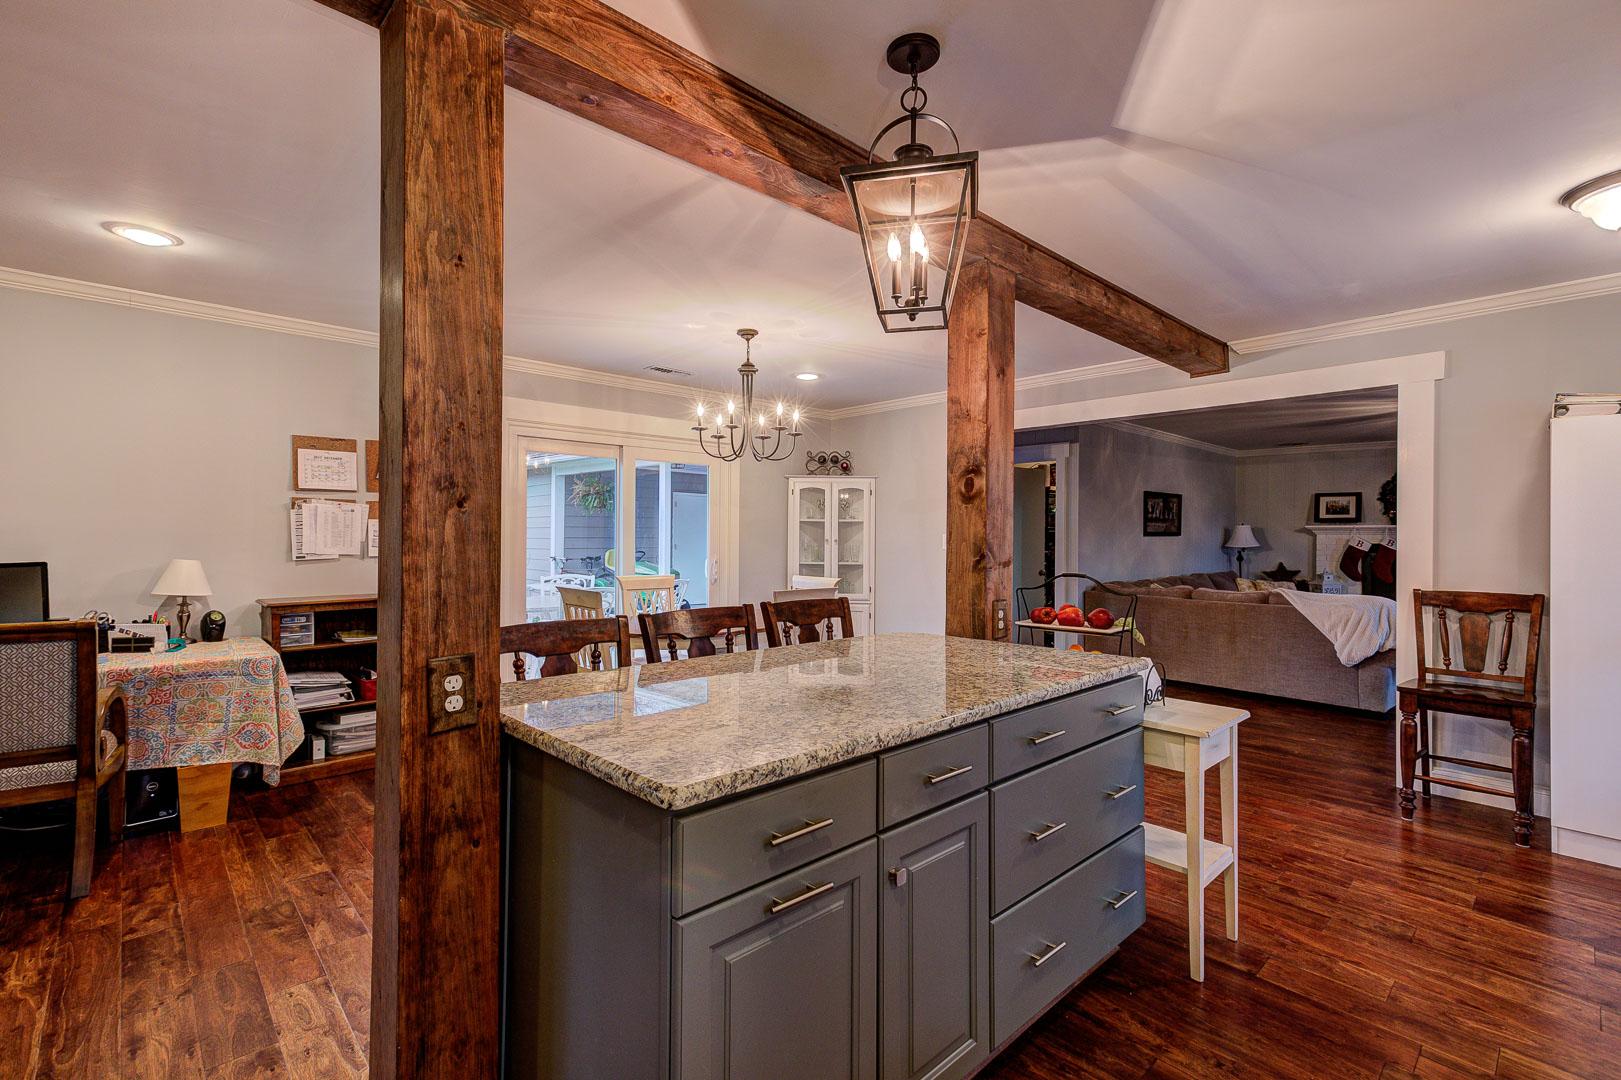 Custom kitchen island with rustic wood beams